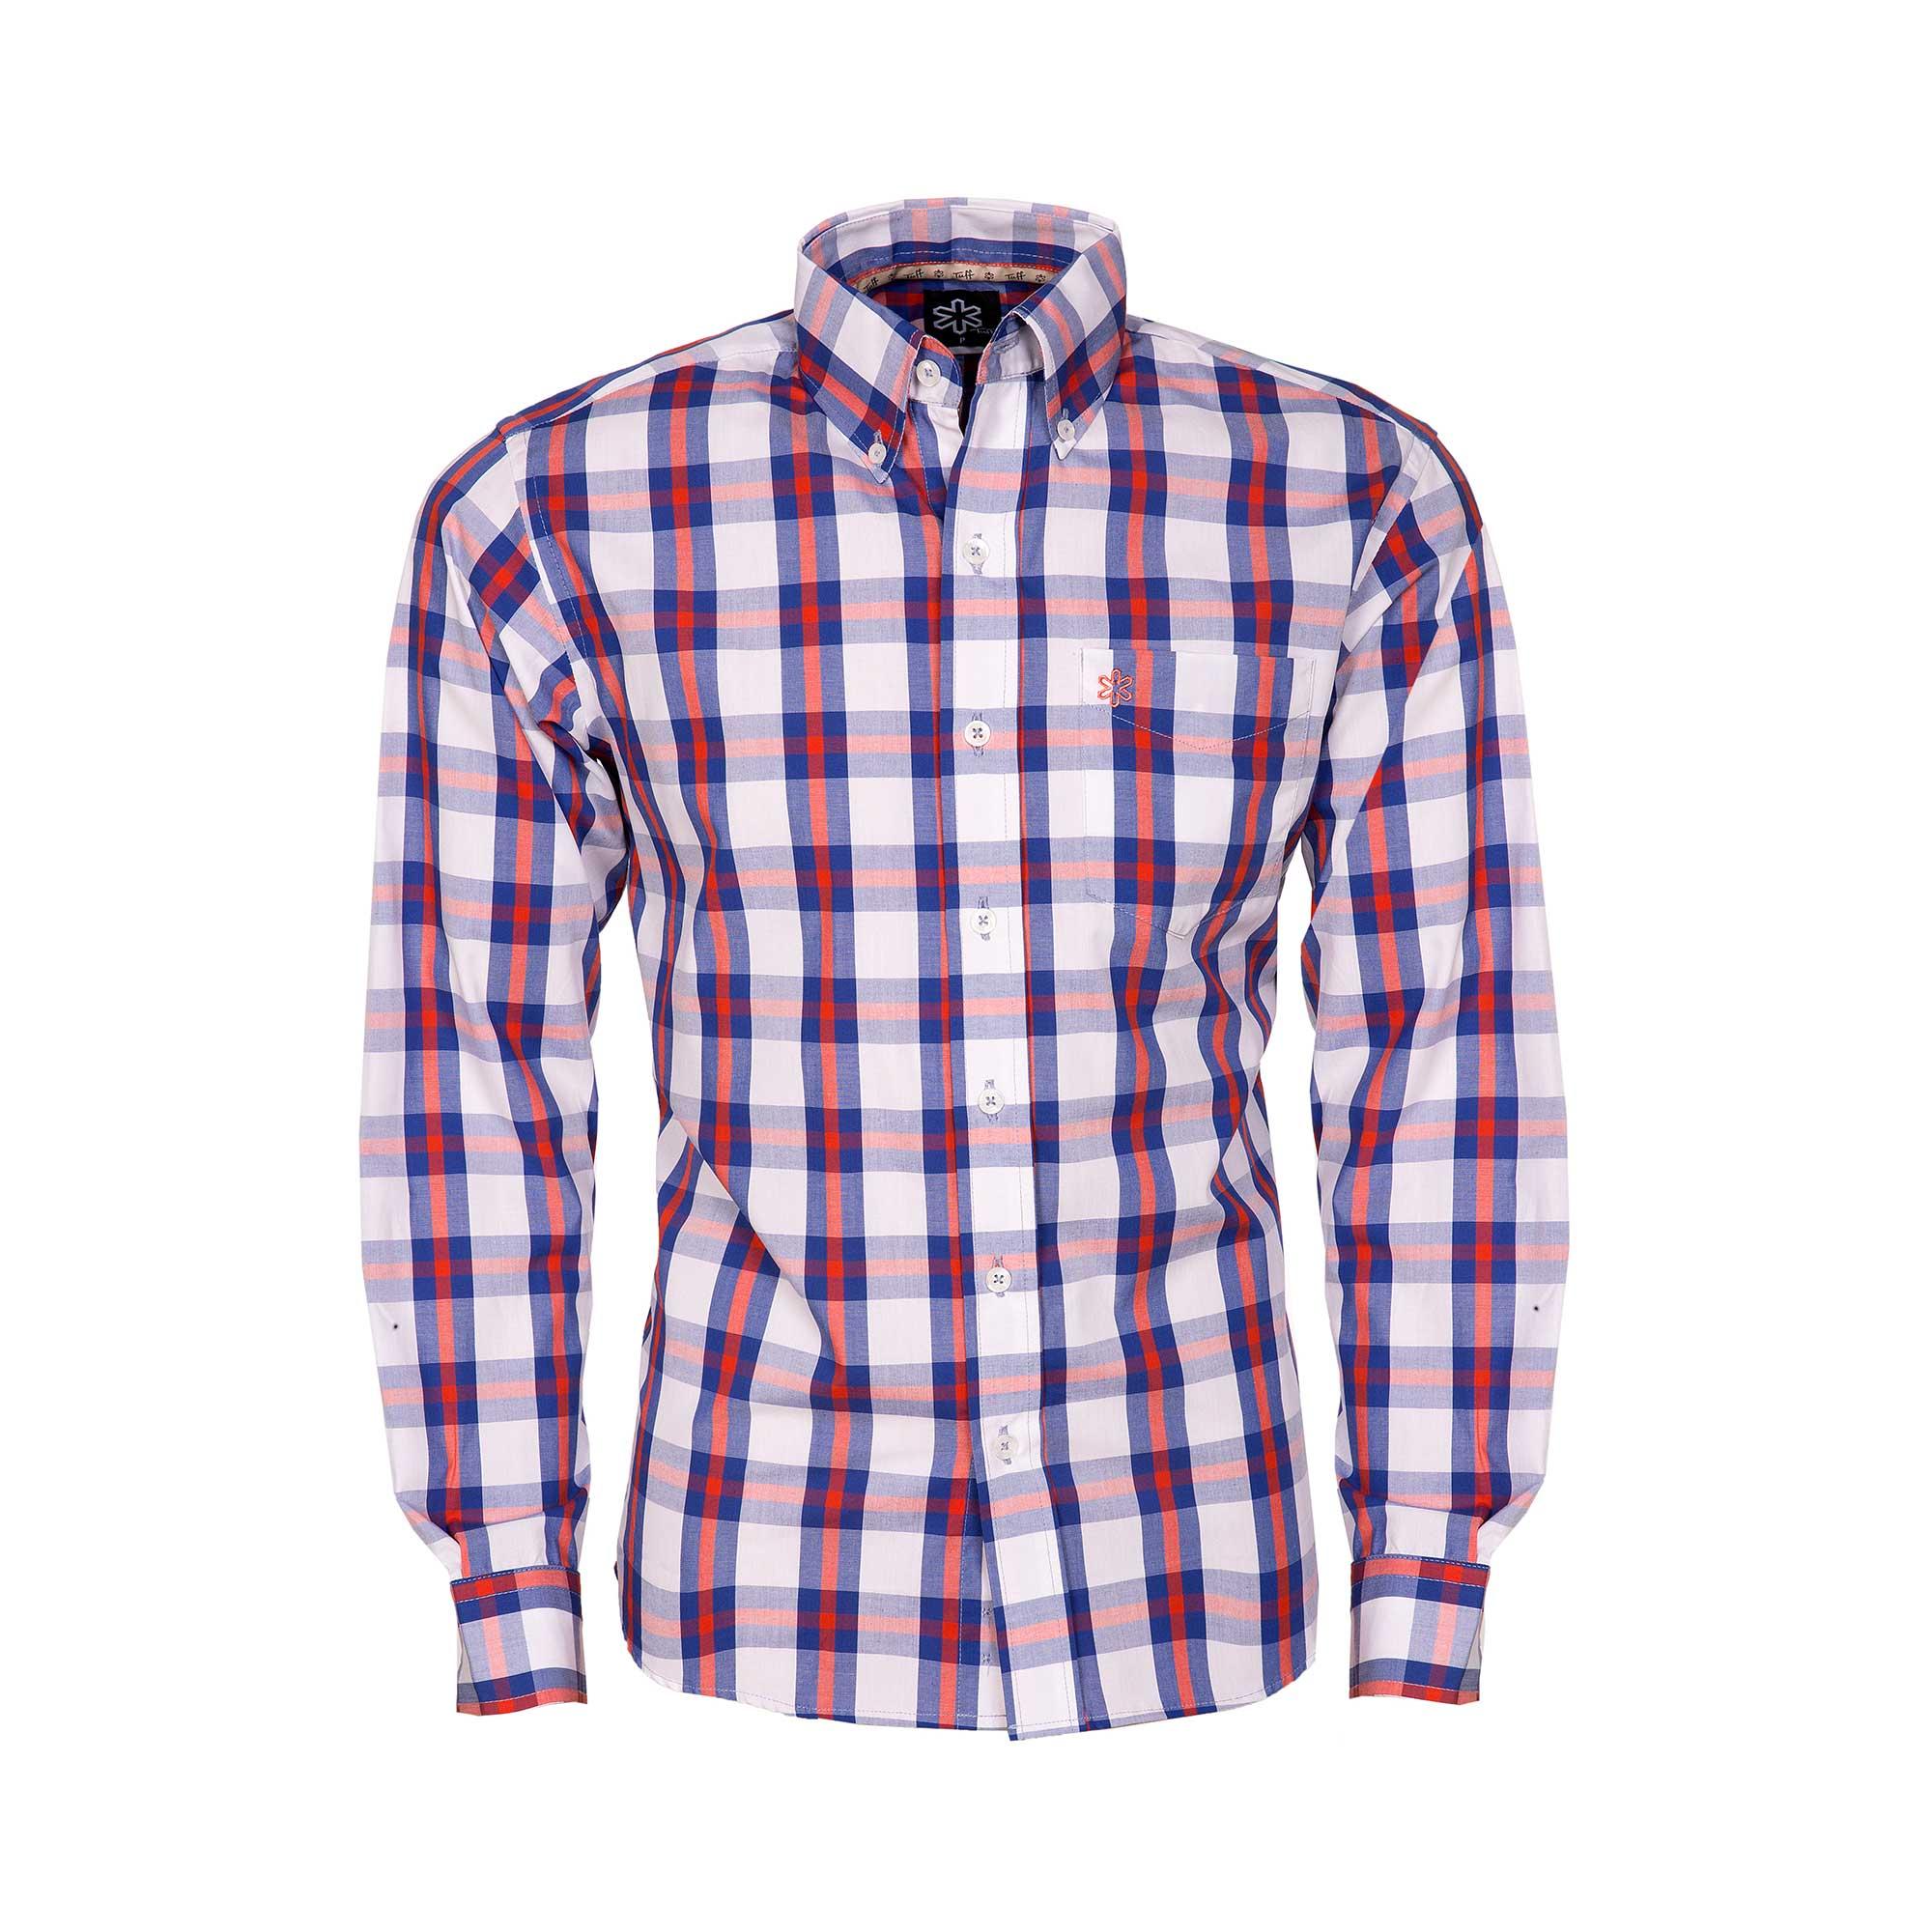 Camisa Masculina Manga Longa Xadrez Branco e Vermelho